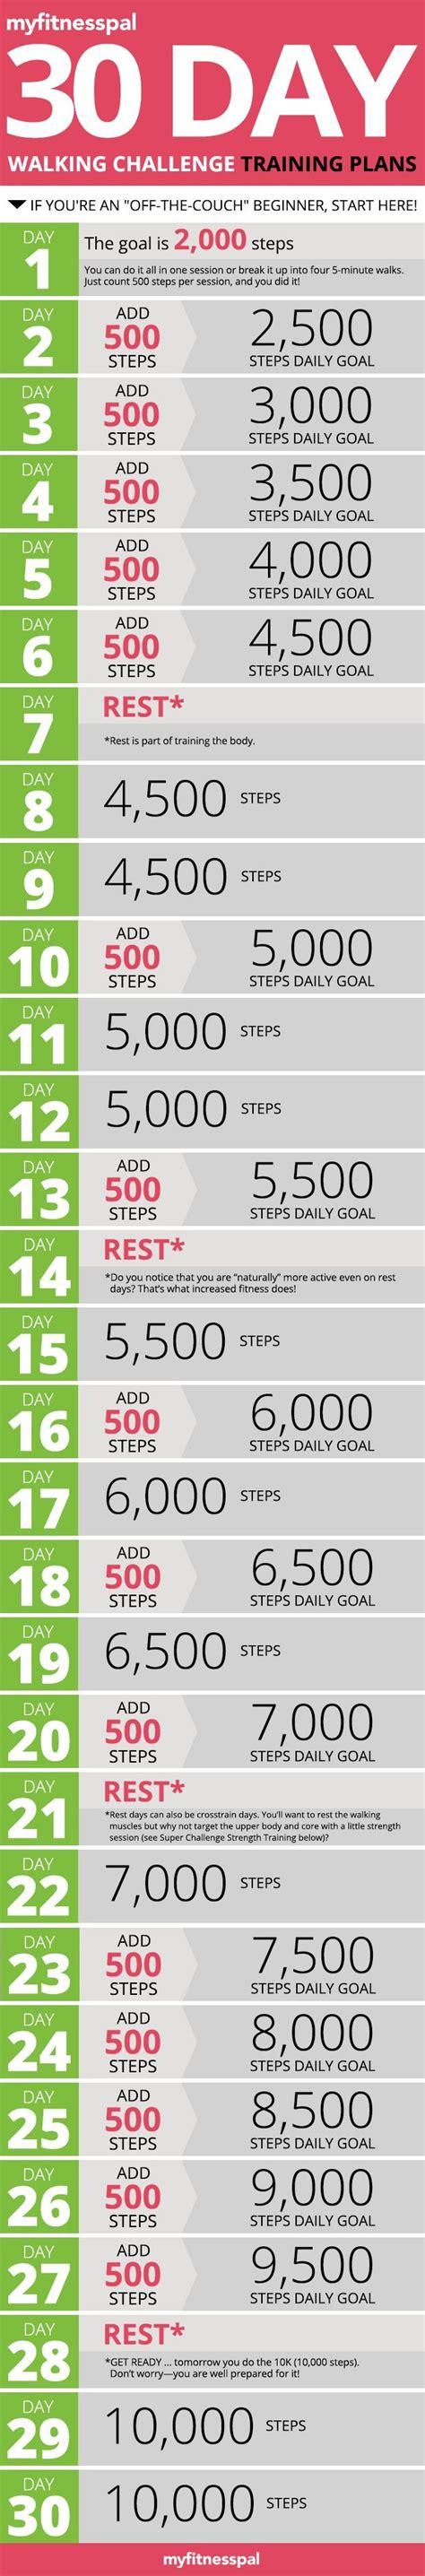 work weight loss challenge spreadsheet new weight loss challenge